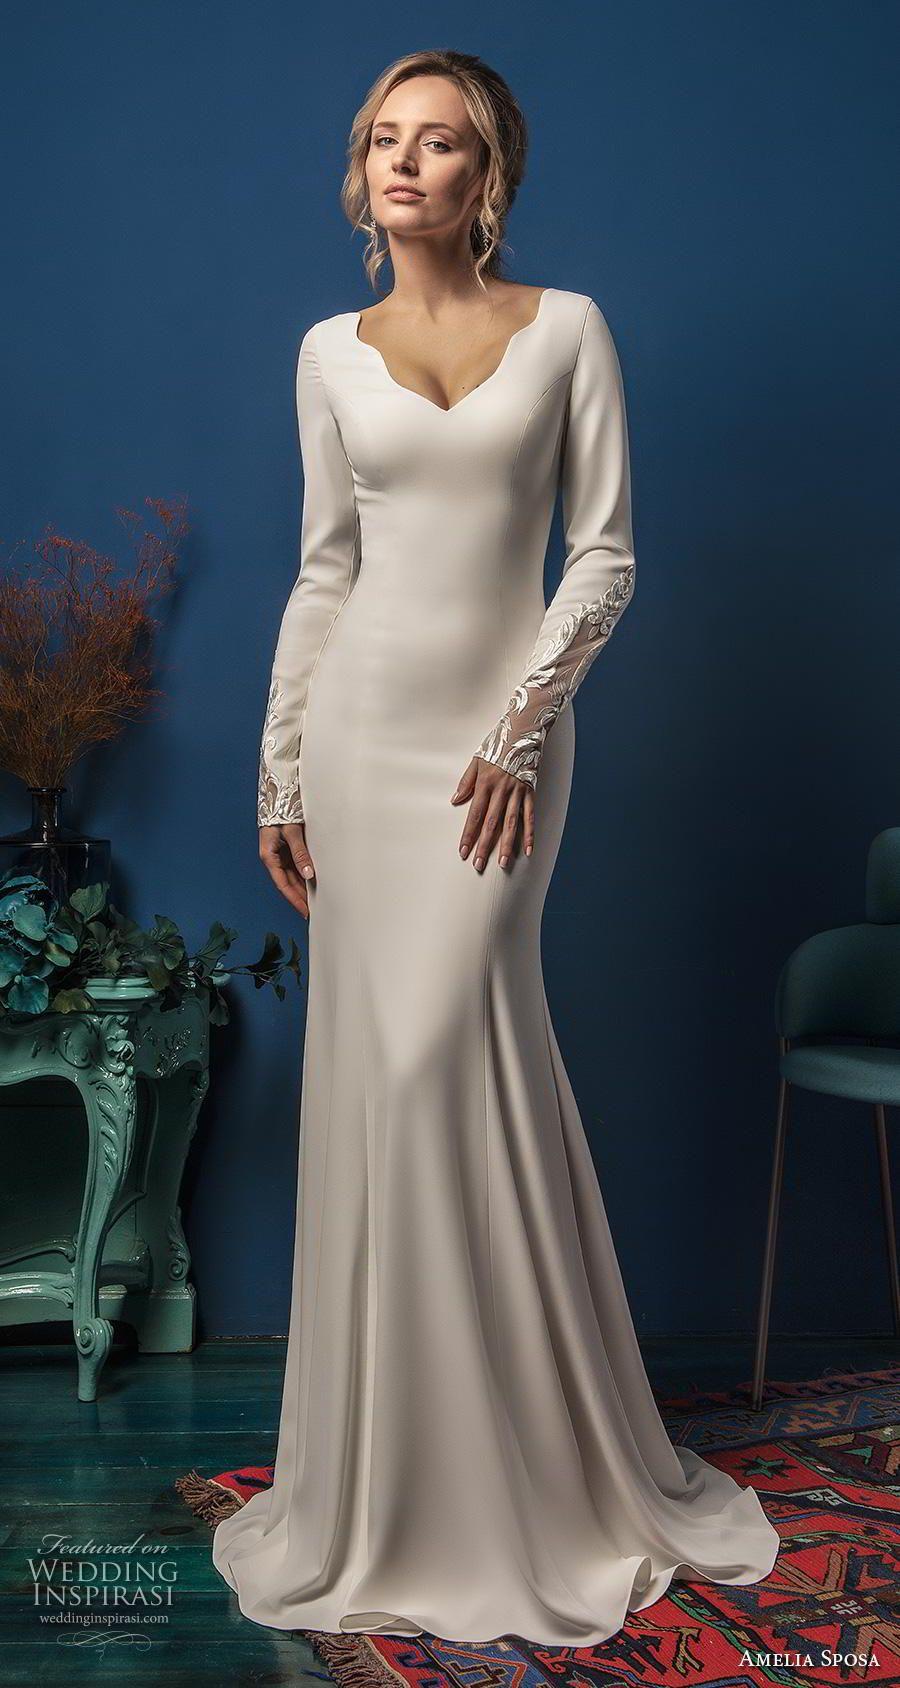 Amelia Sposa 2019 Wedding Dresses Elegance Bridal Collection Wedding Inspirasi Wedding Dresses Sheer Wedding Dress Wedding Dress Long Sleeve [ 1688 x 900 Pixel ]